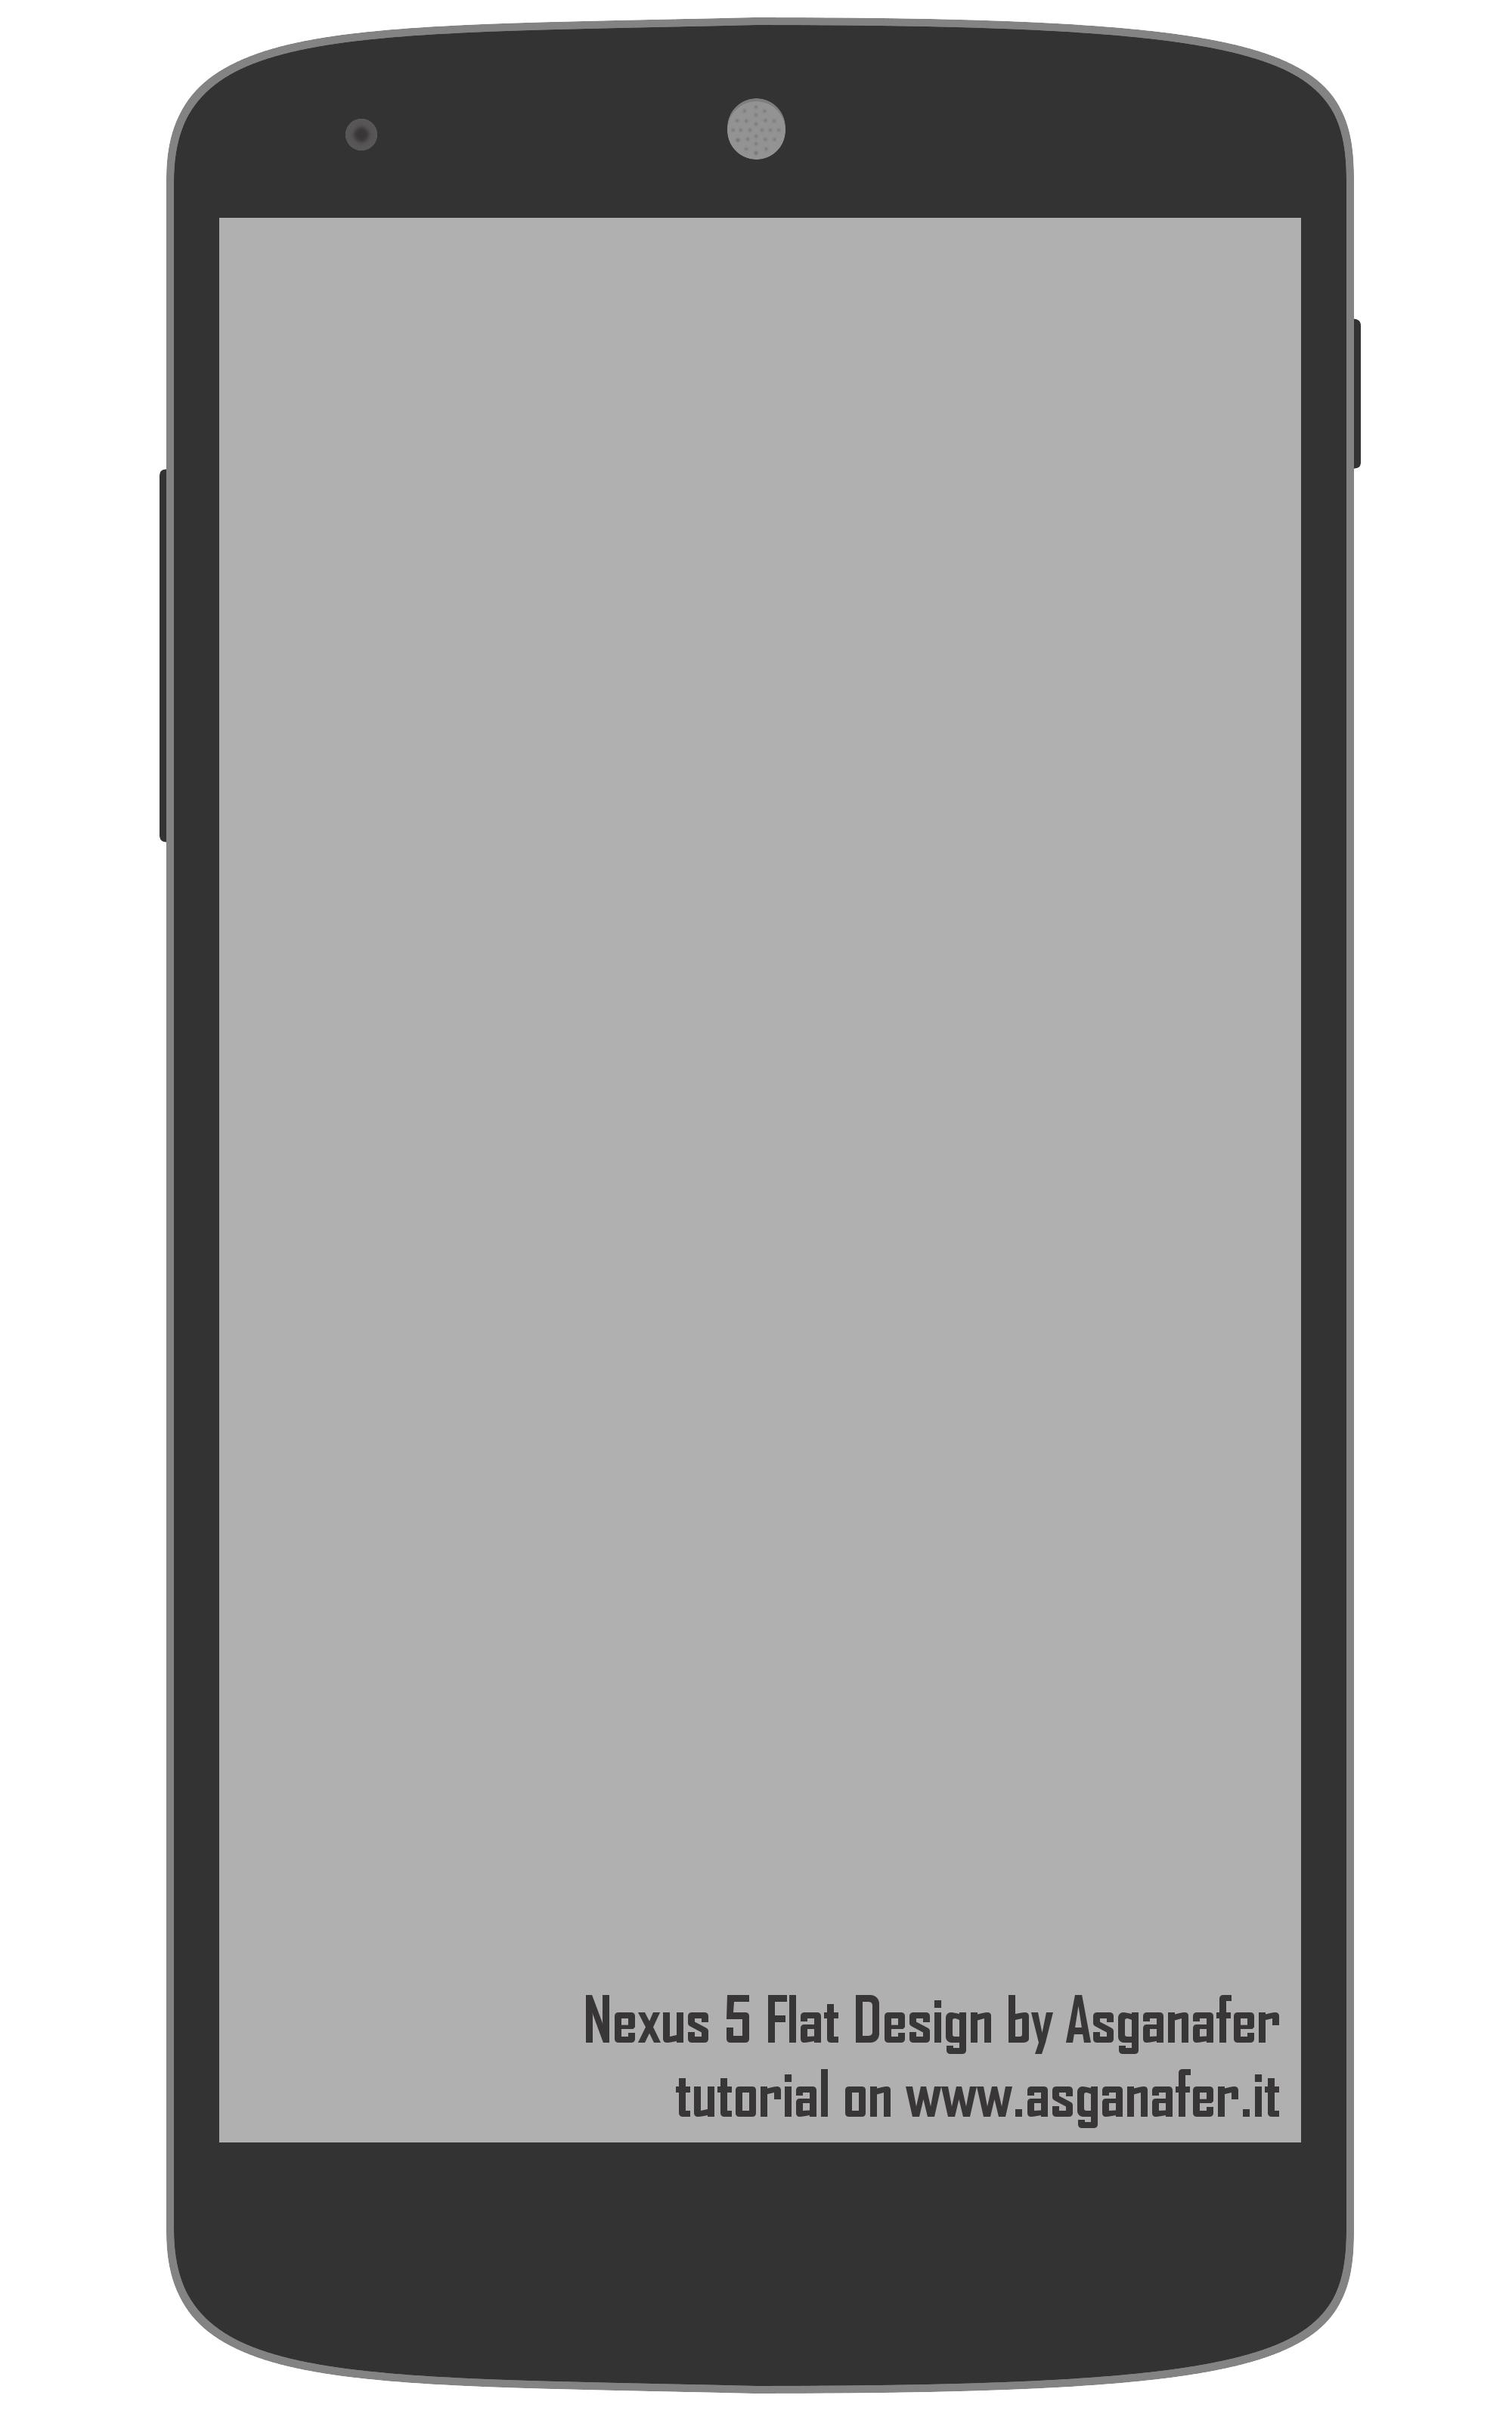 Nexus 5 Flat by asganafer